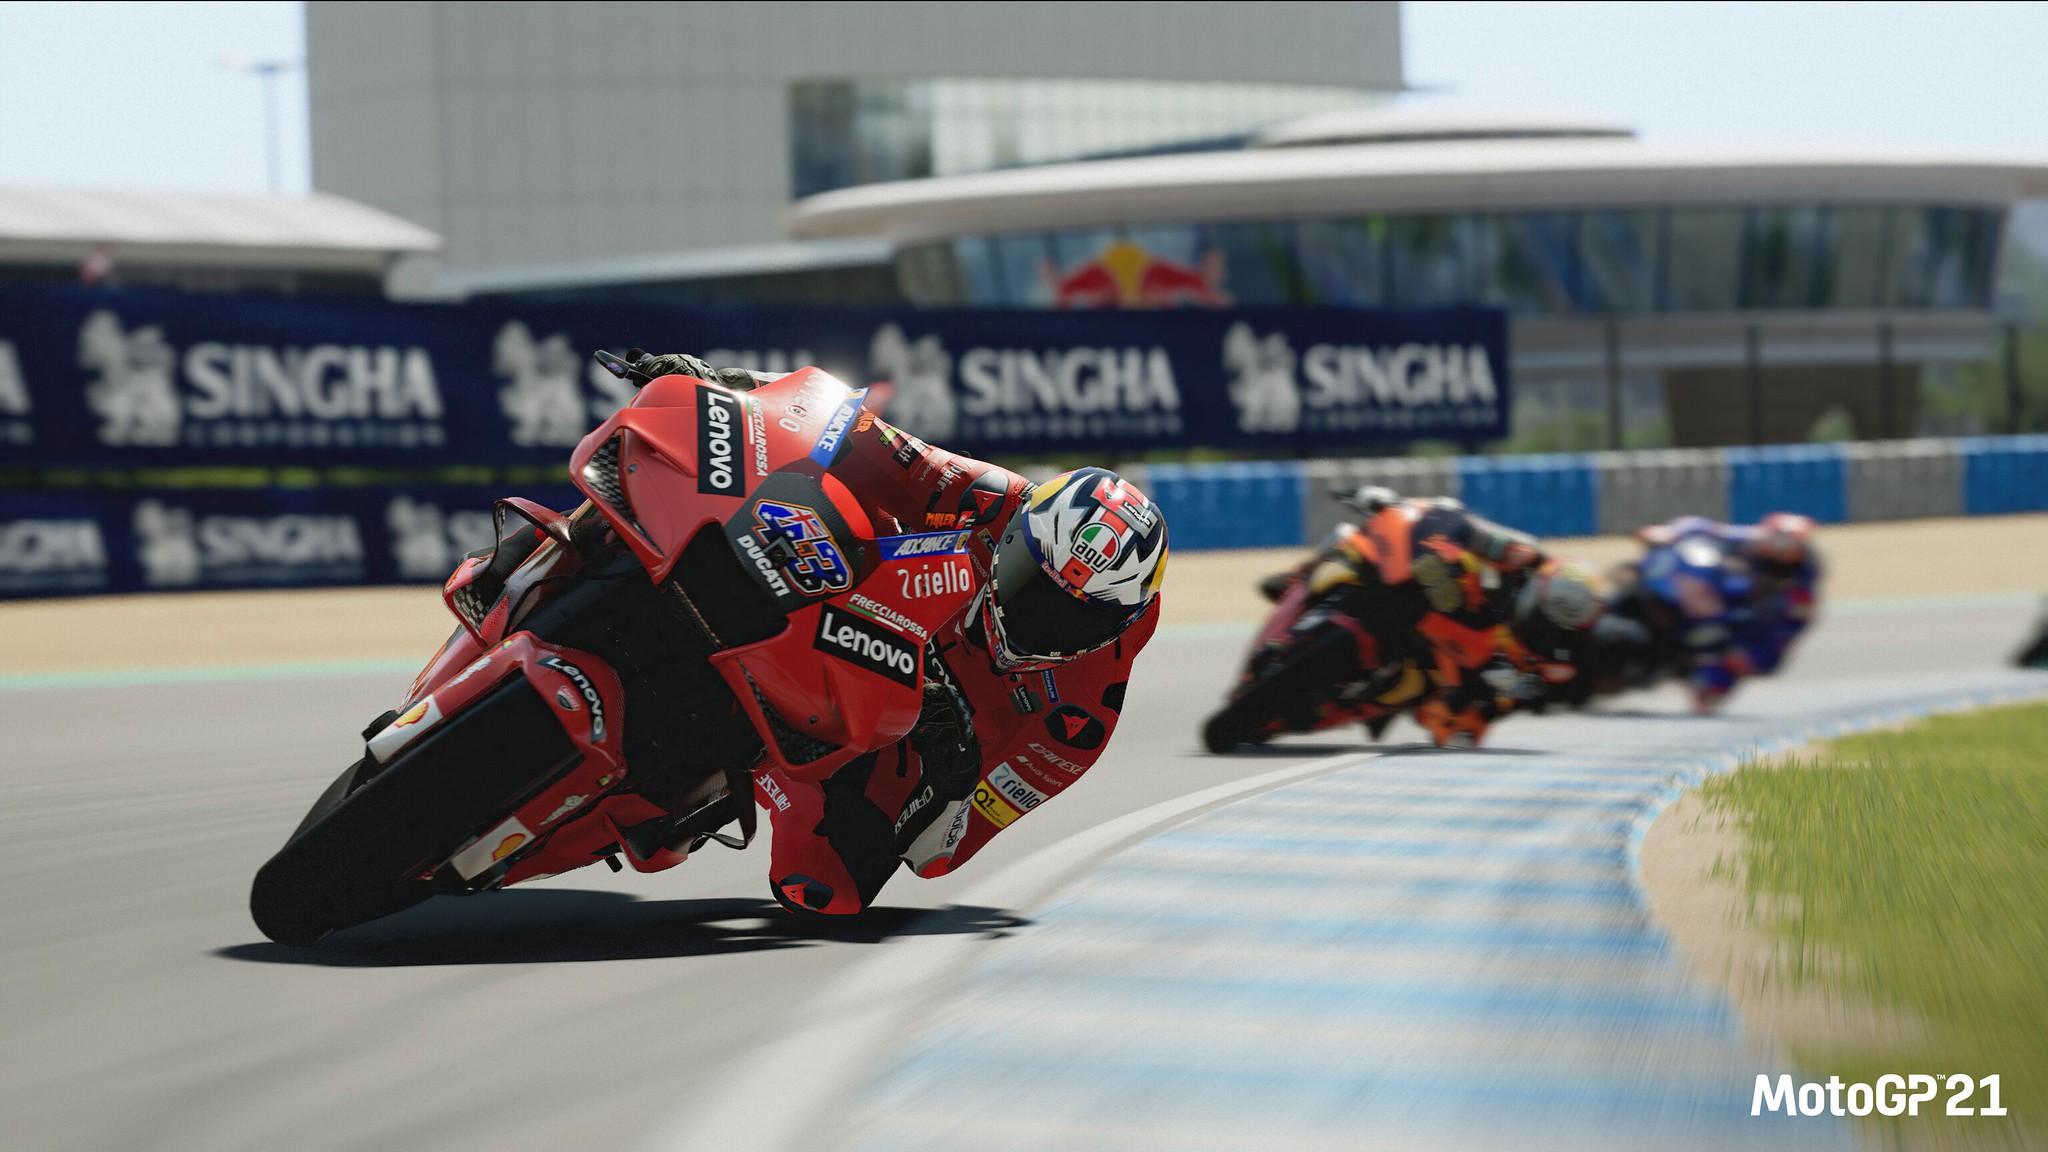 MotoGP-Pure-Gameplay-13-4K